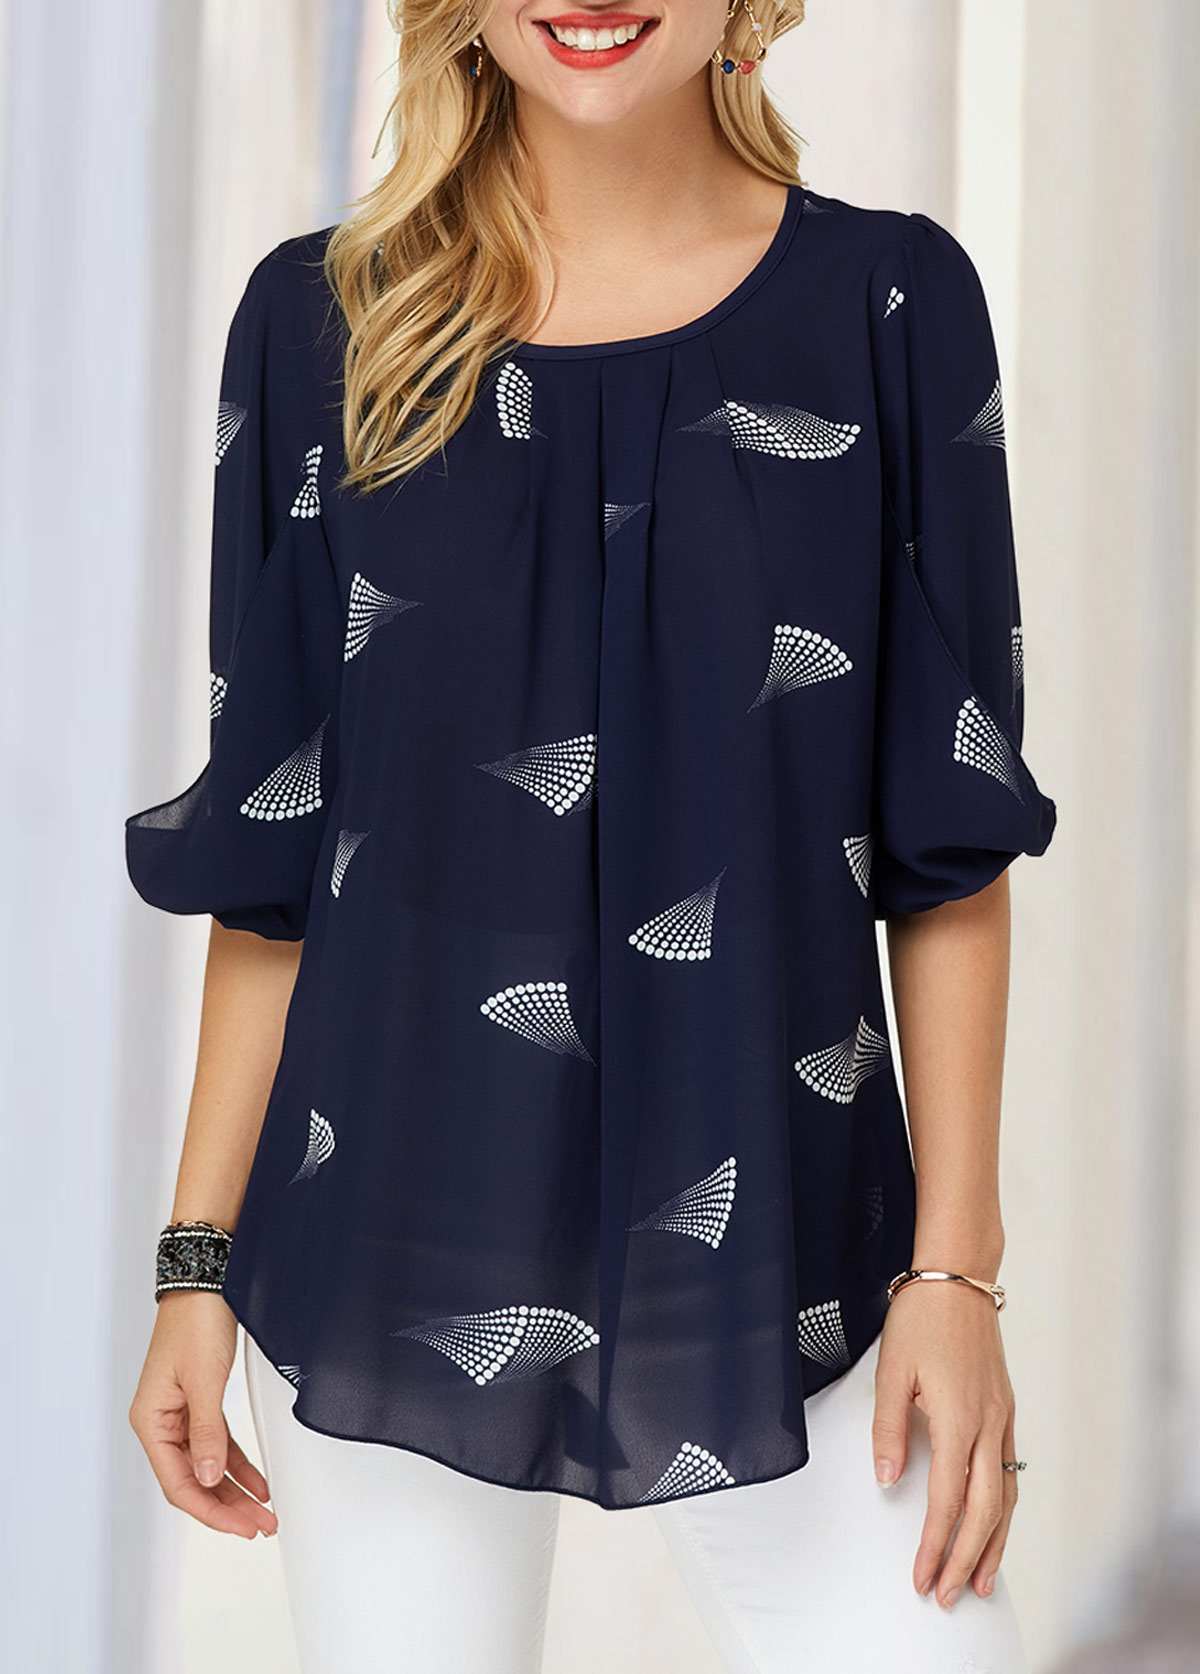 ROTITA Blouson Sleeve Printed Navy Blue Blouse